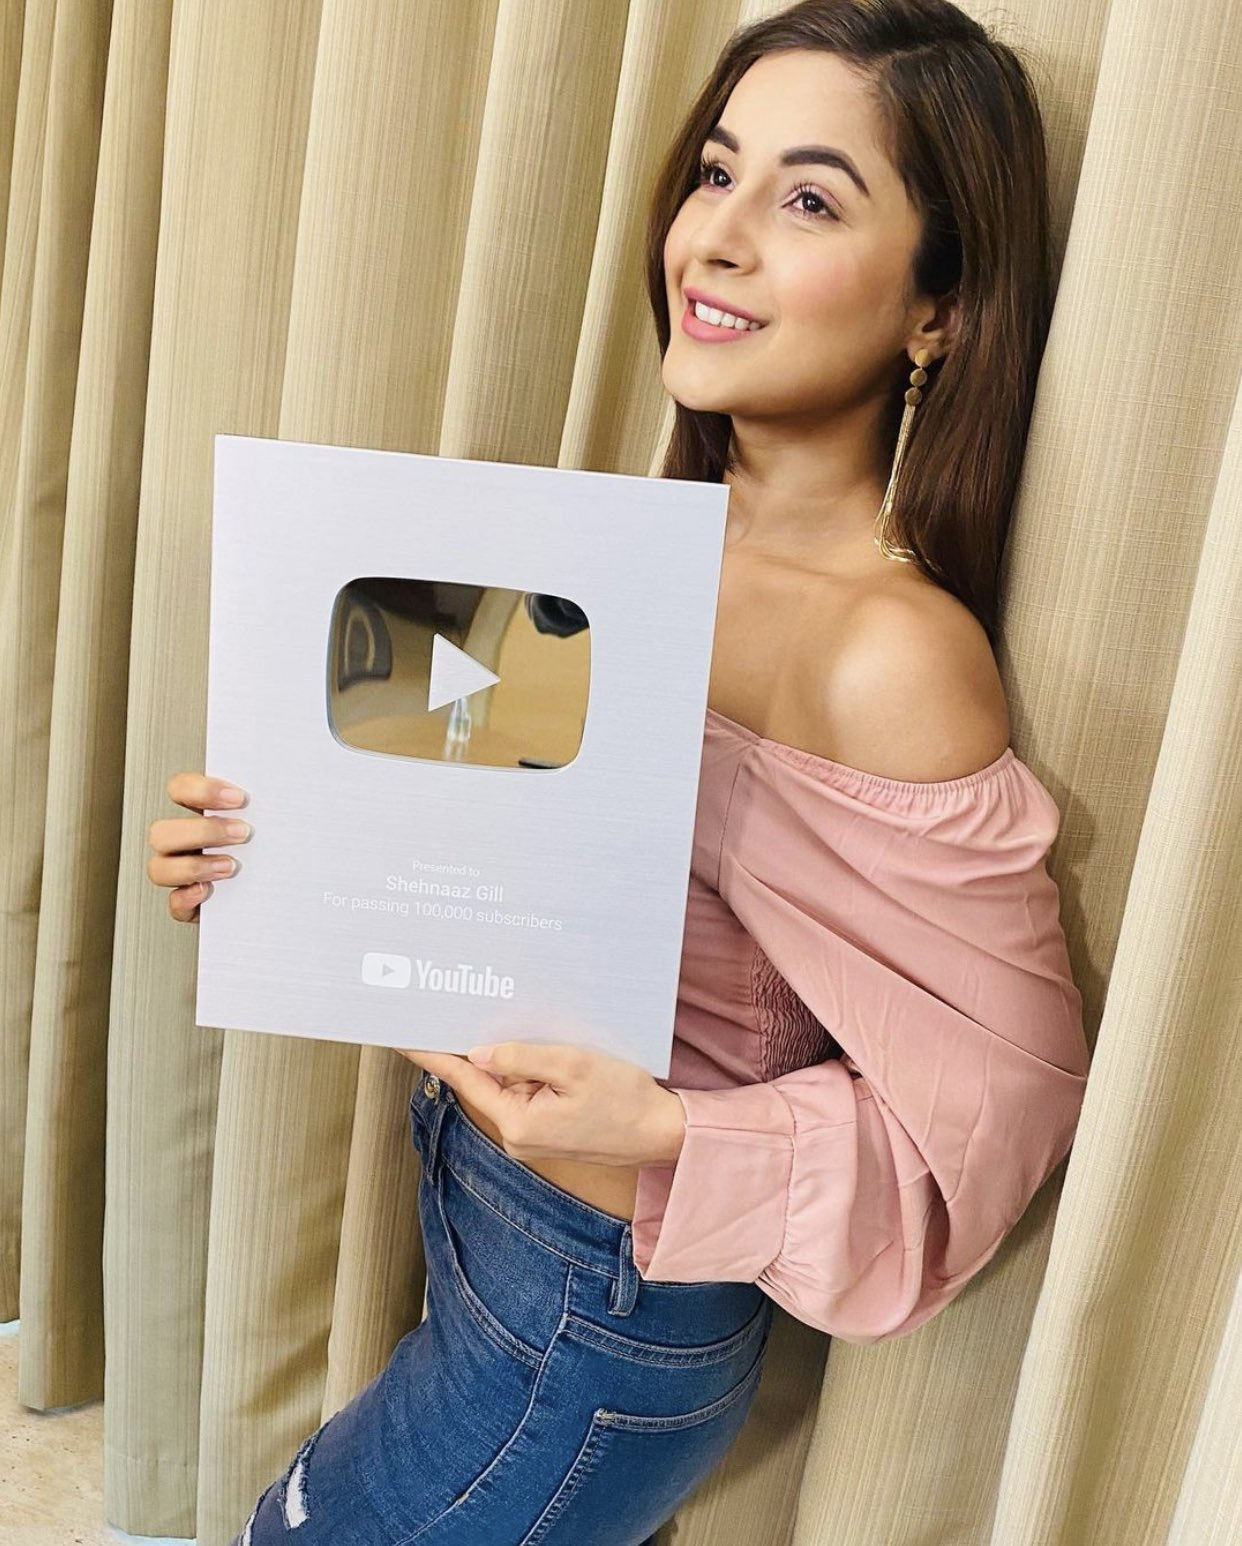 Shehnaaz With Youtube Silver Play  Button